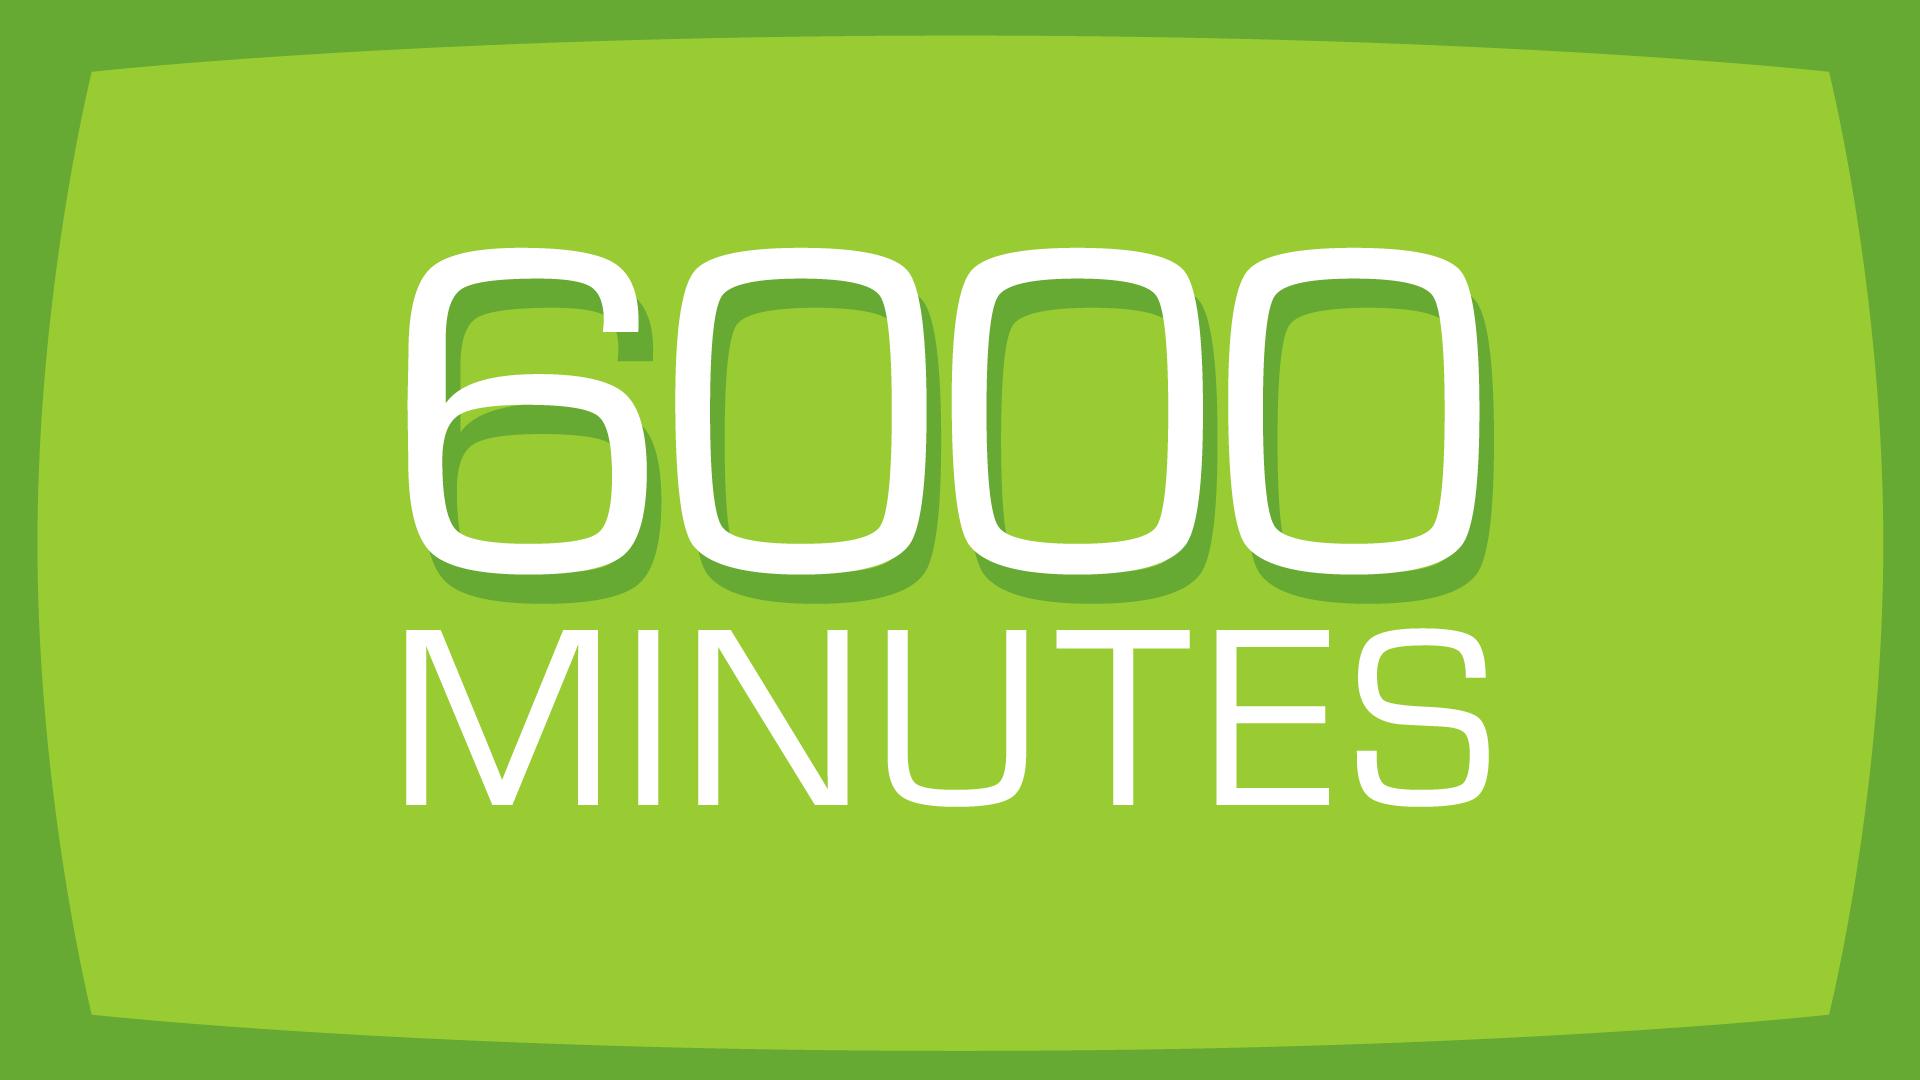 6000 Minutes